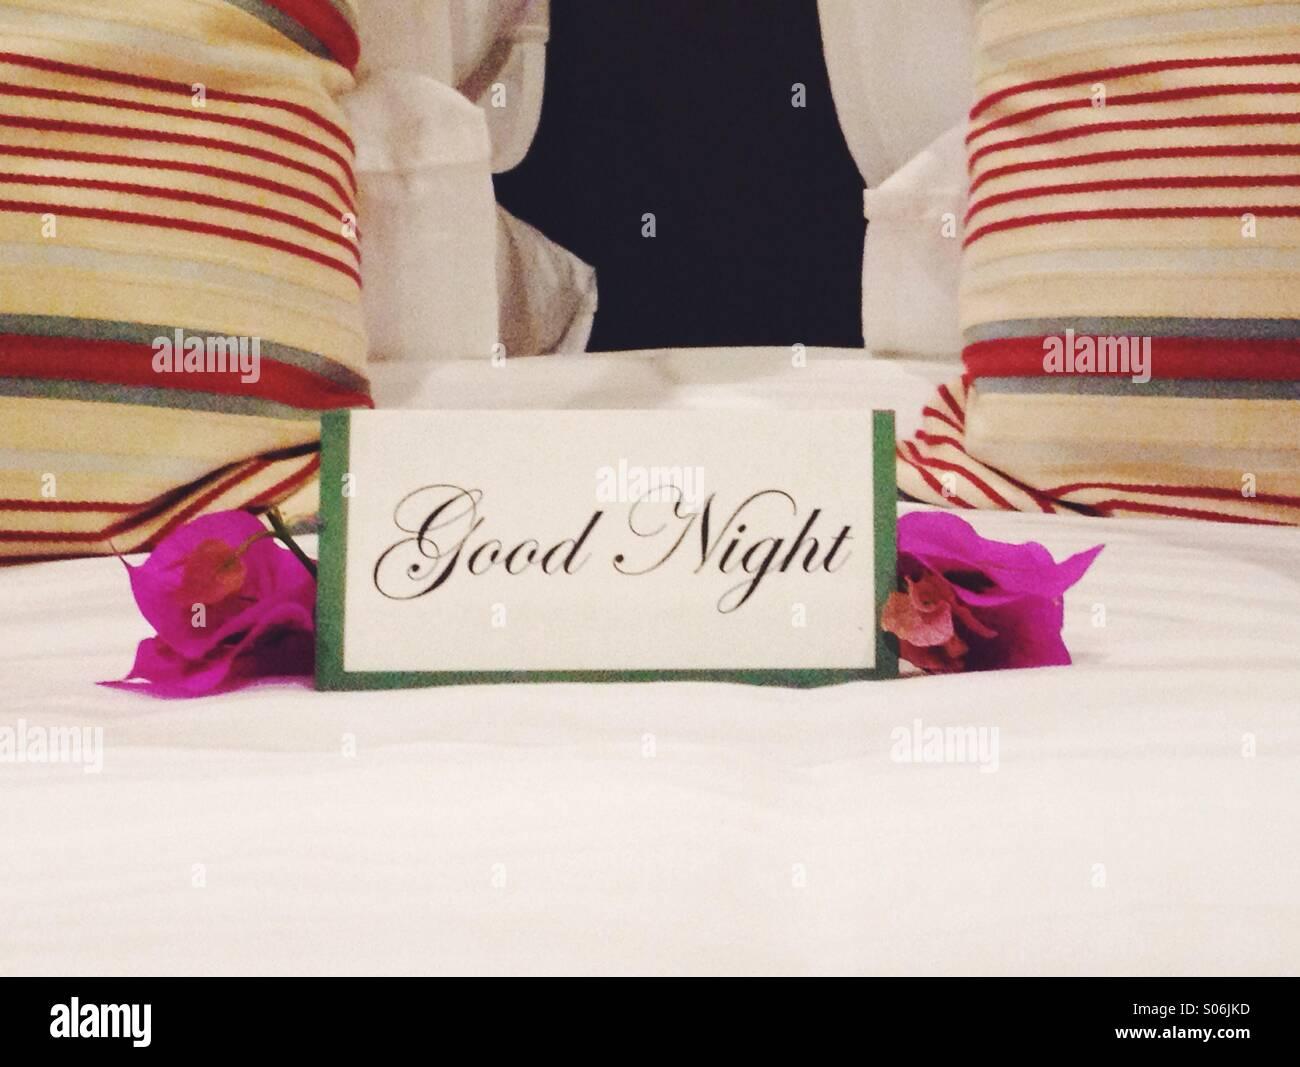 Good Night - Stock Image